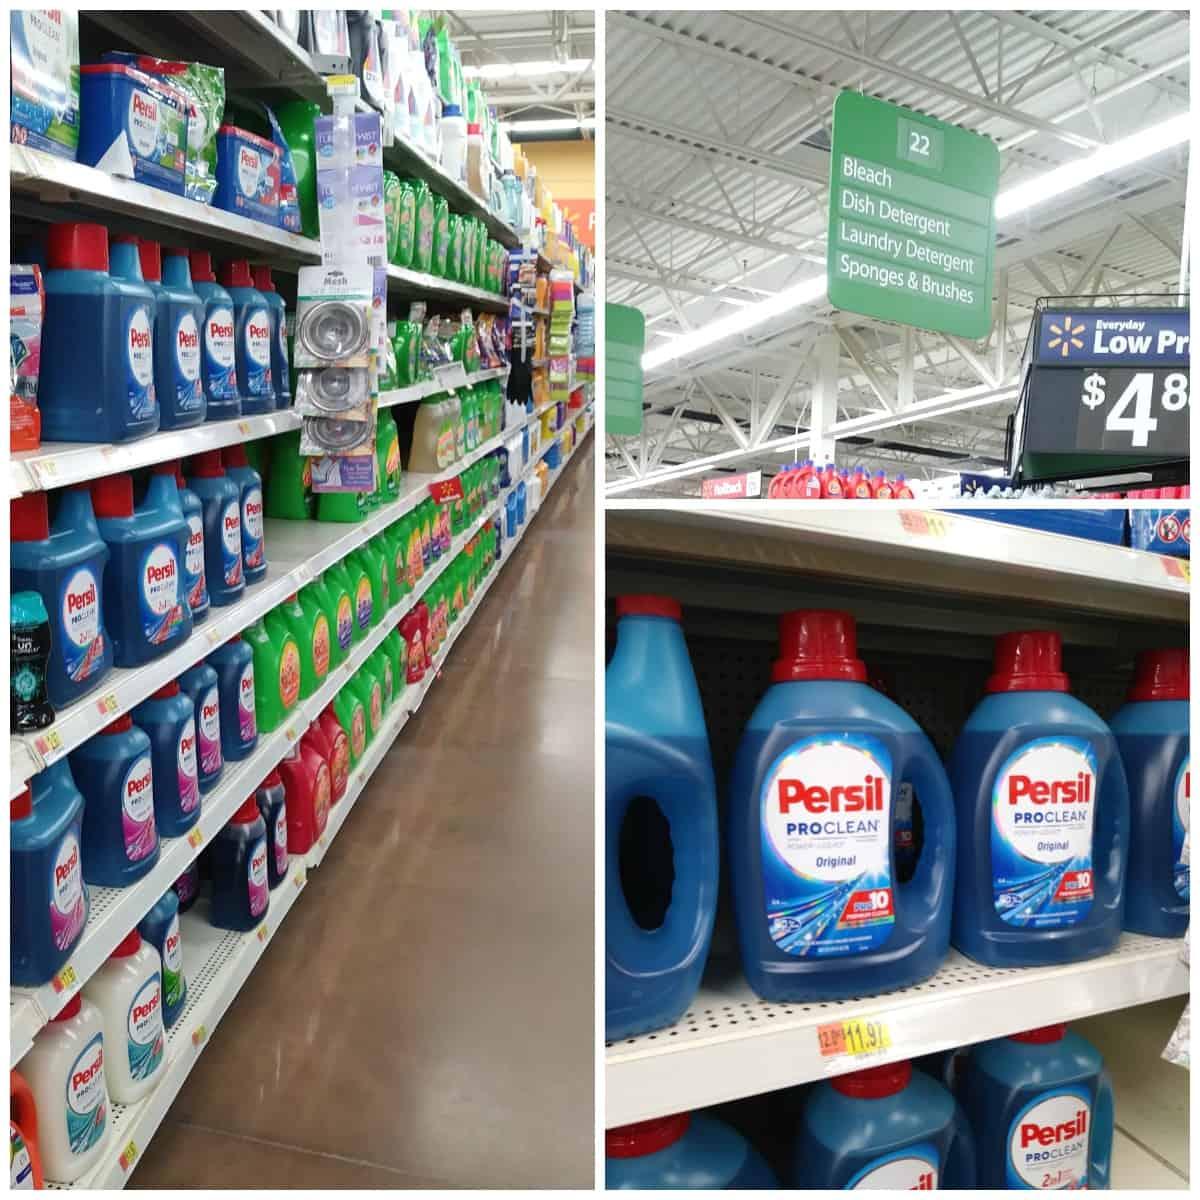 Persil at Walmart